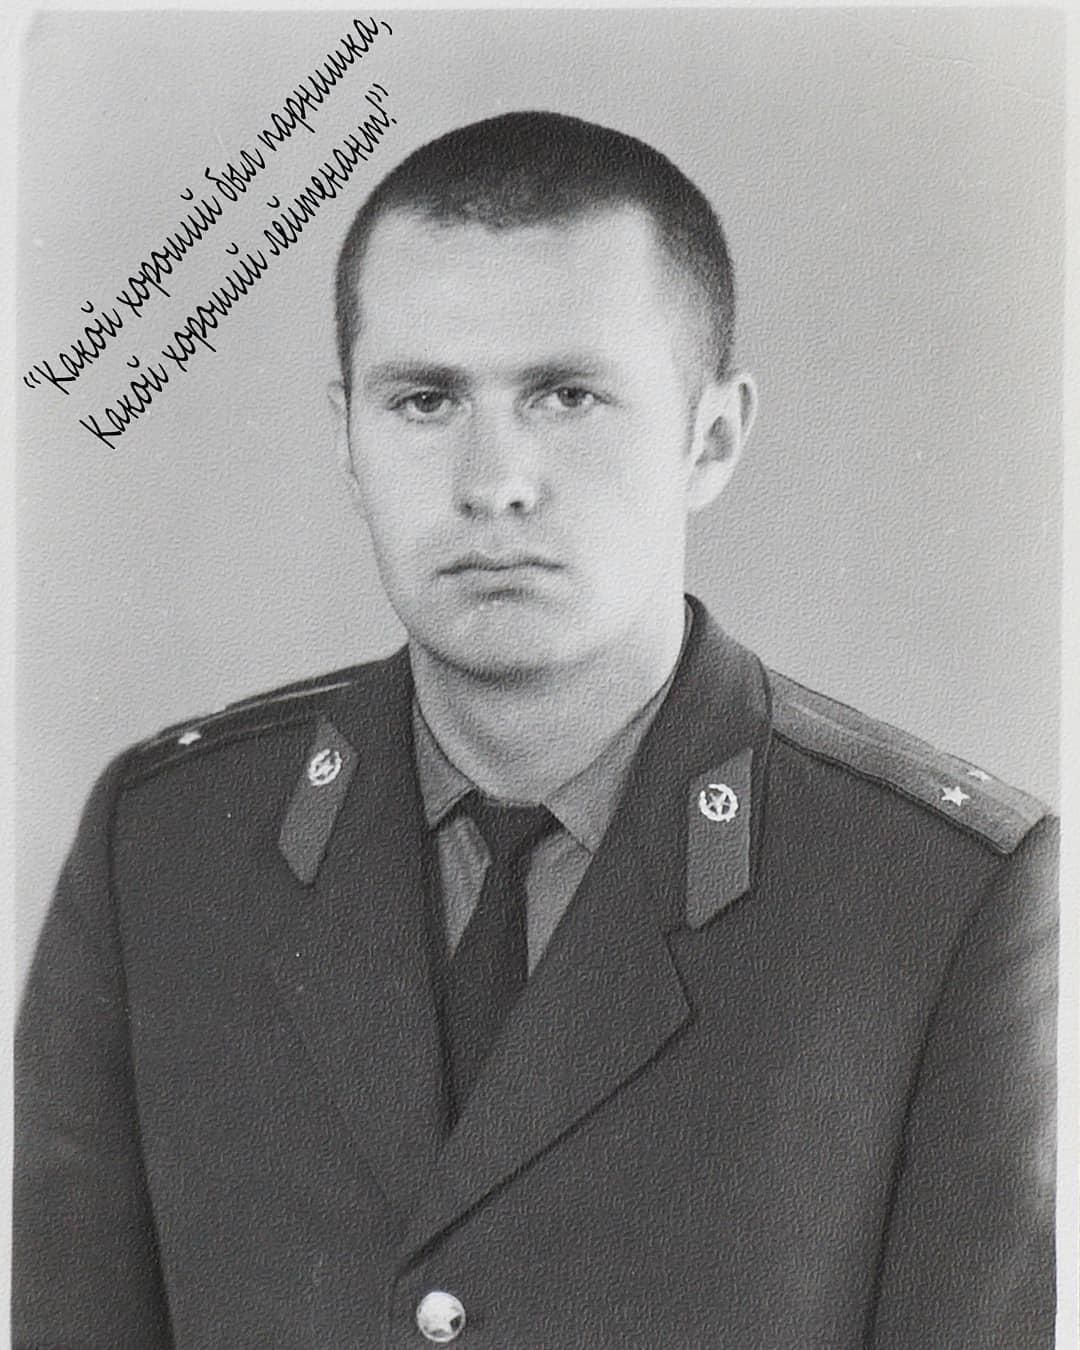 Младший лейтенант, мальчик молодой….Узнали